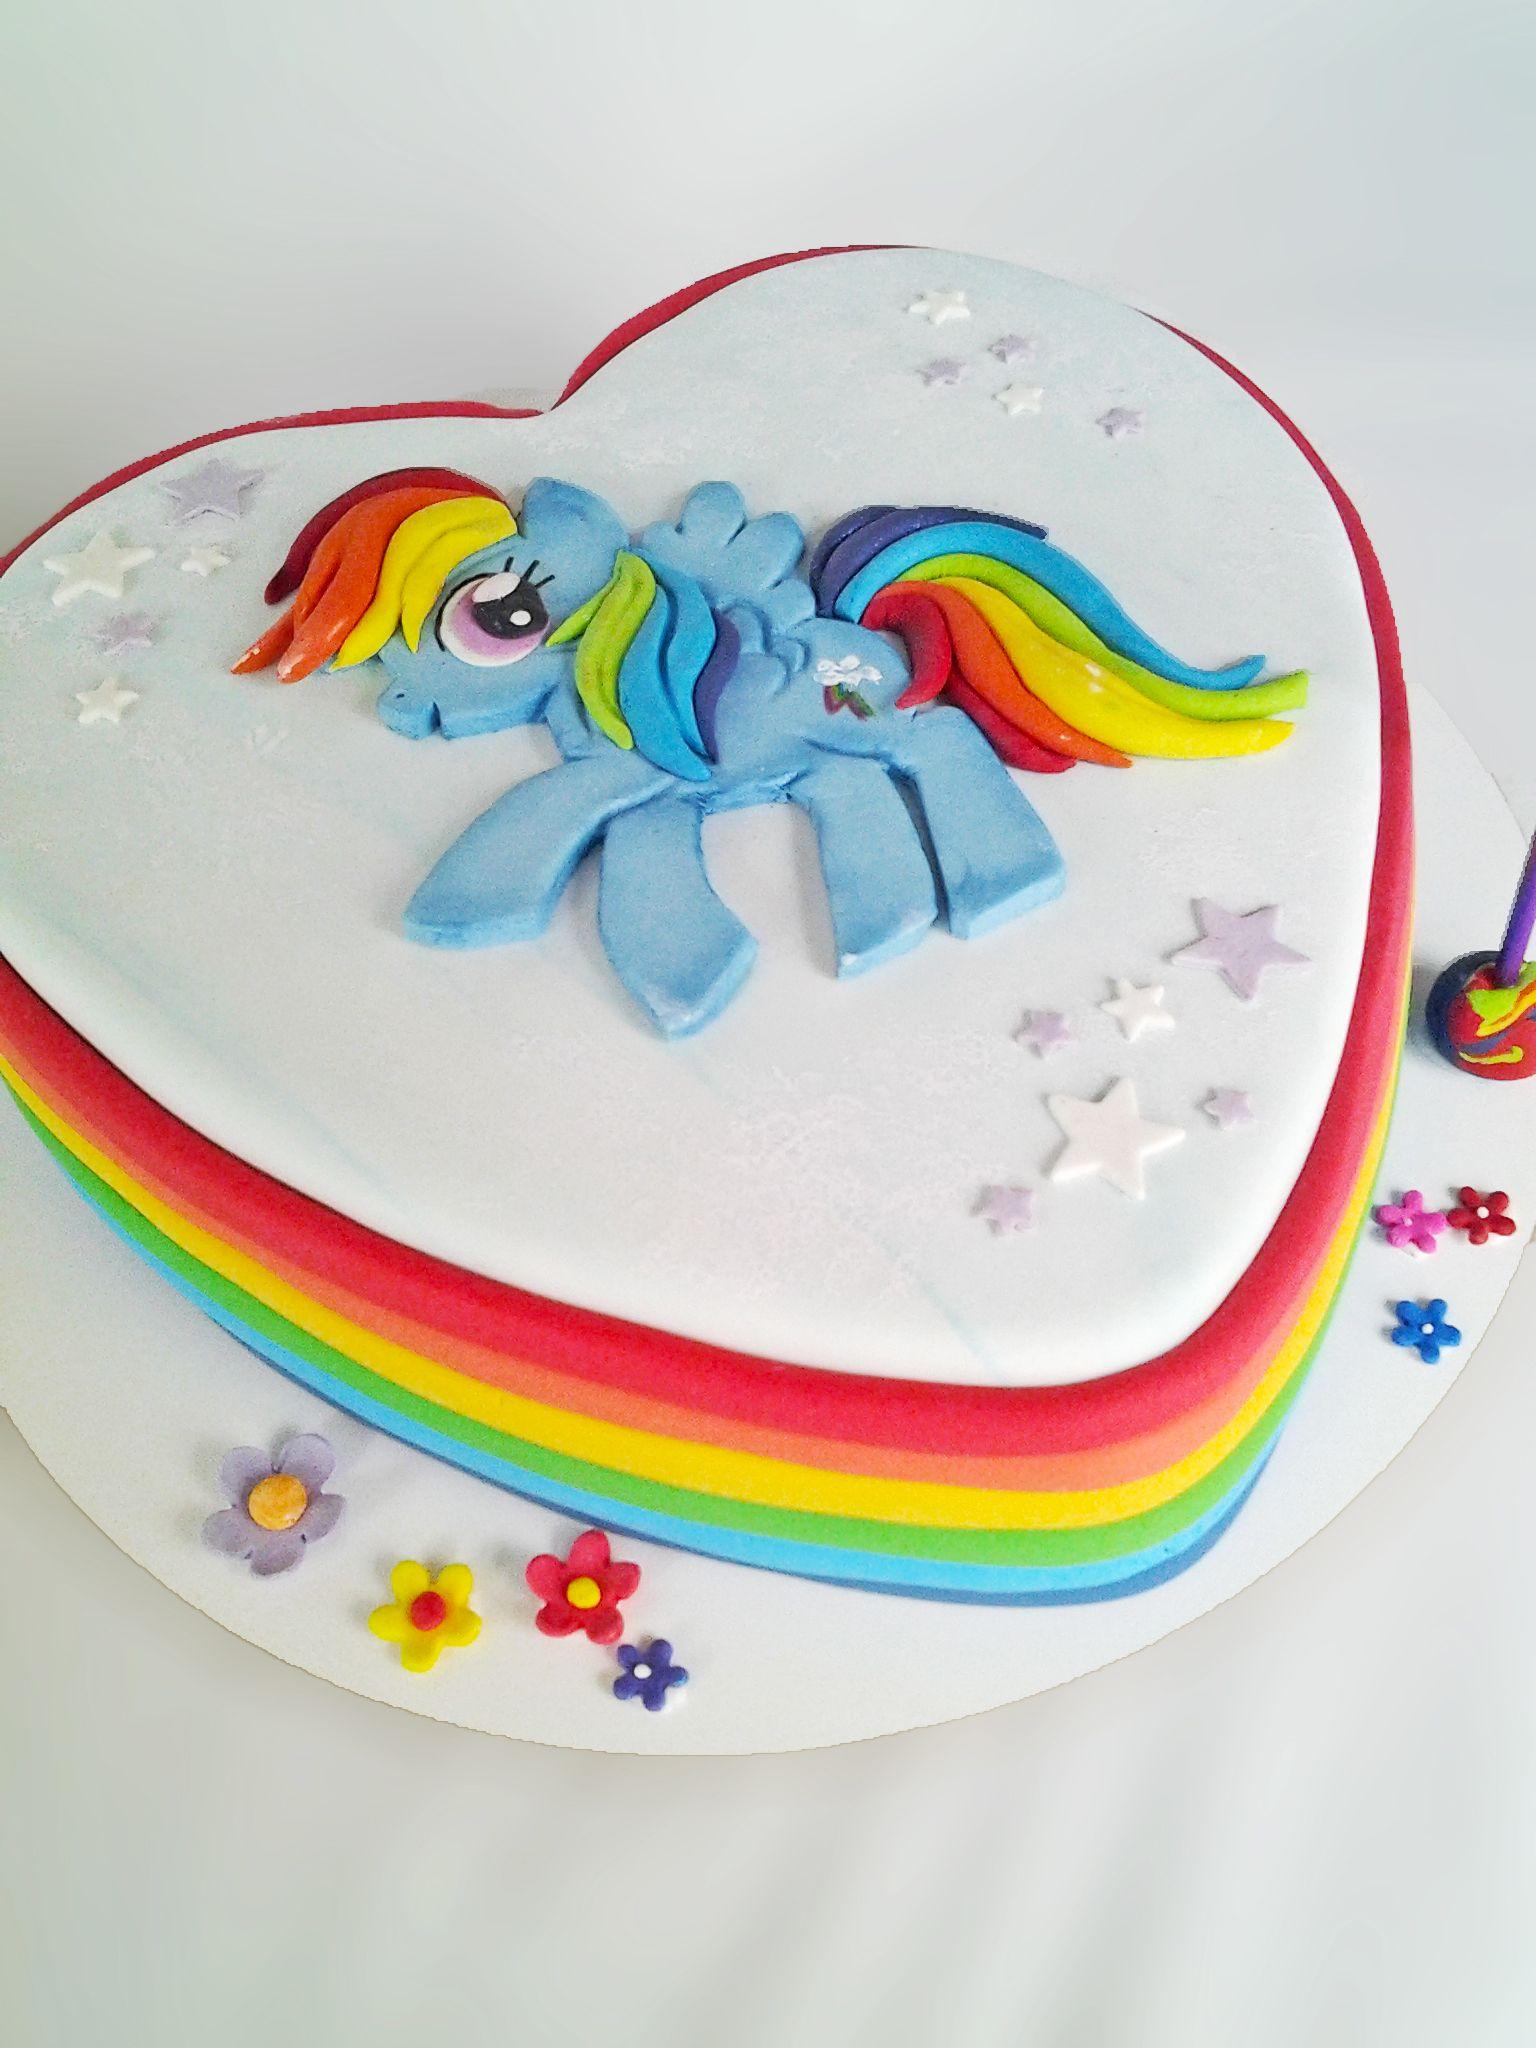 Torta My Little Pony Rainbow Dash Tortas Con Personajes